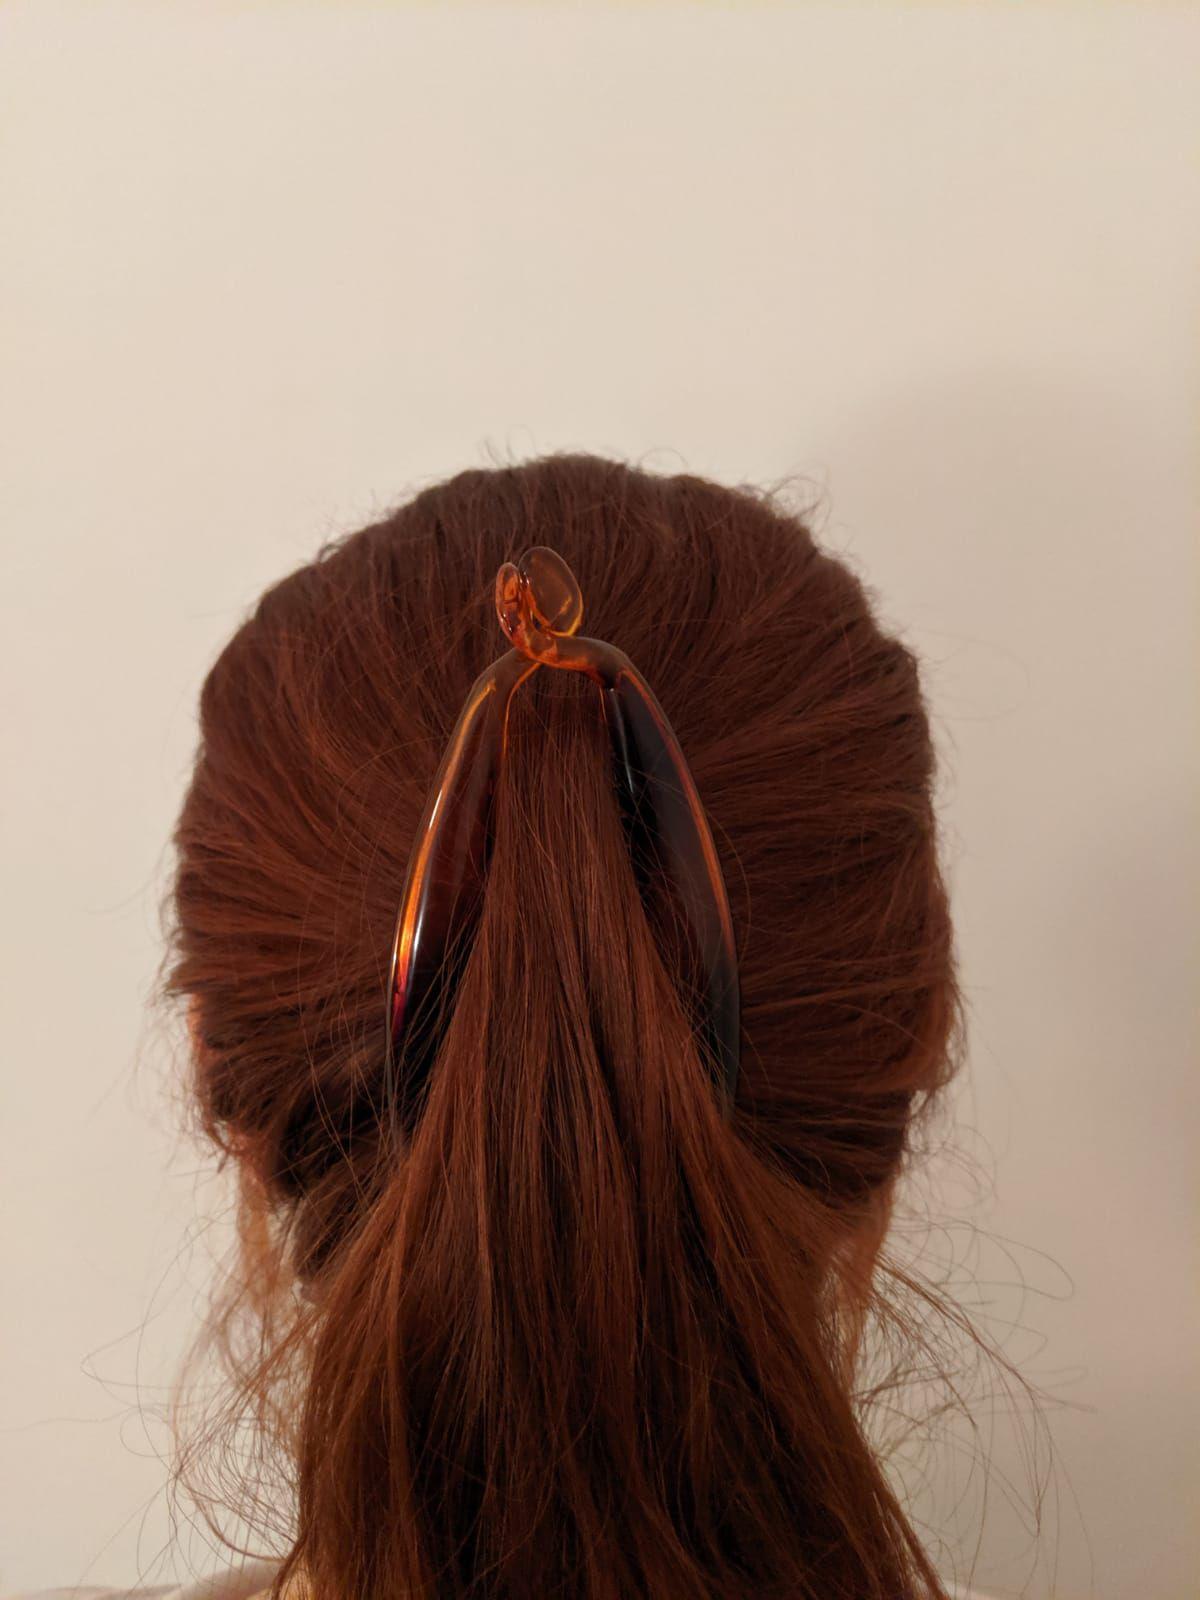 Back view of woman wearing banana hair clip